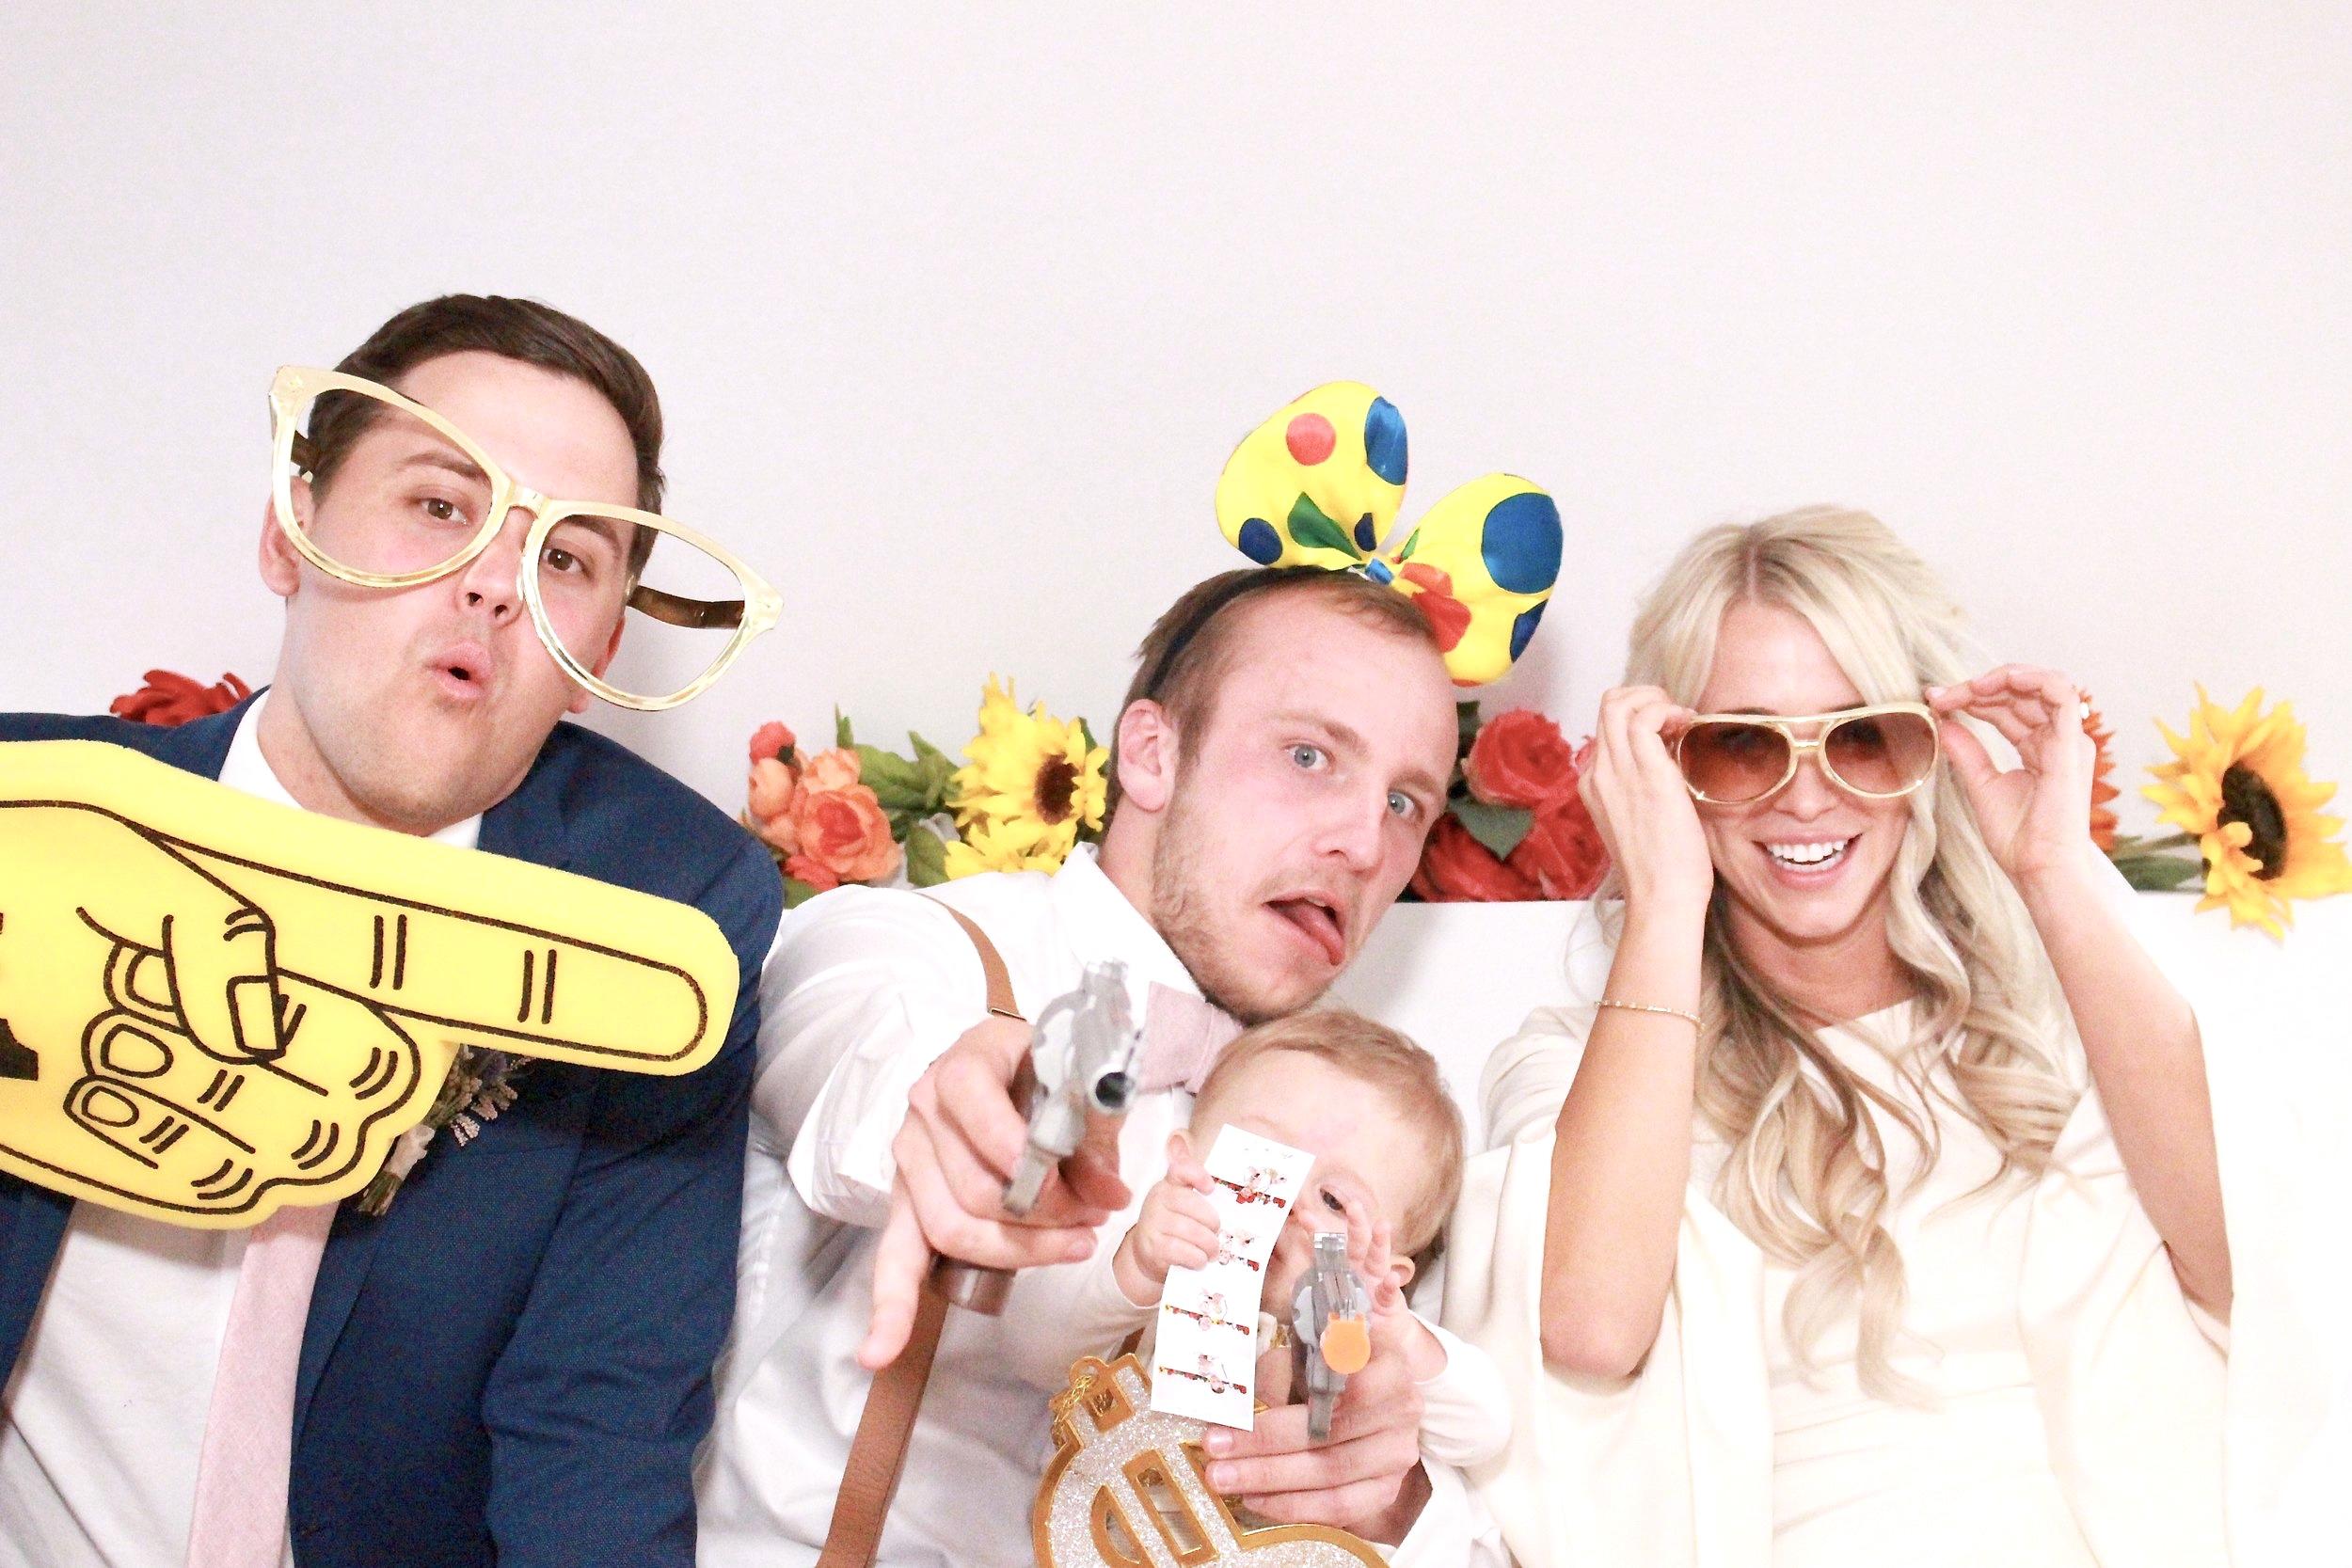 utah photo booth, photo booth, utah wedding photo booth, utah photo booth rental, stay gold photo parlor, stay gold, utah trailer photo booth, trailer photo booth,